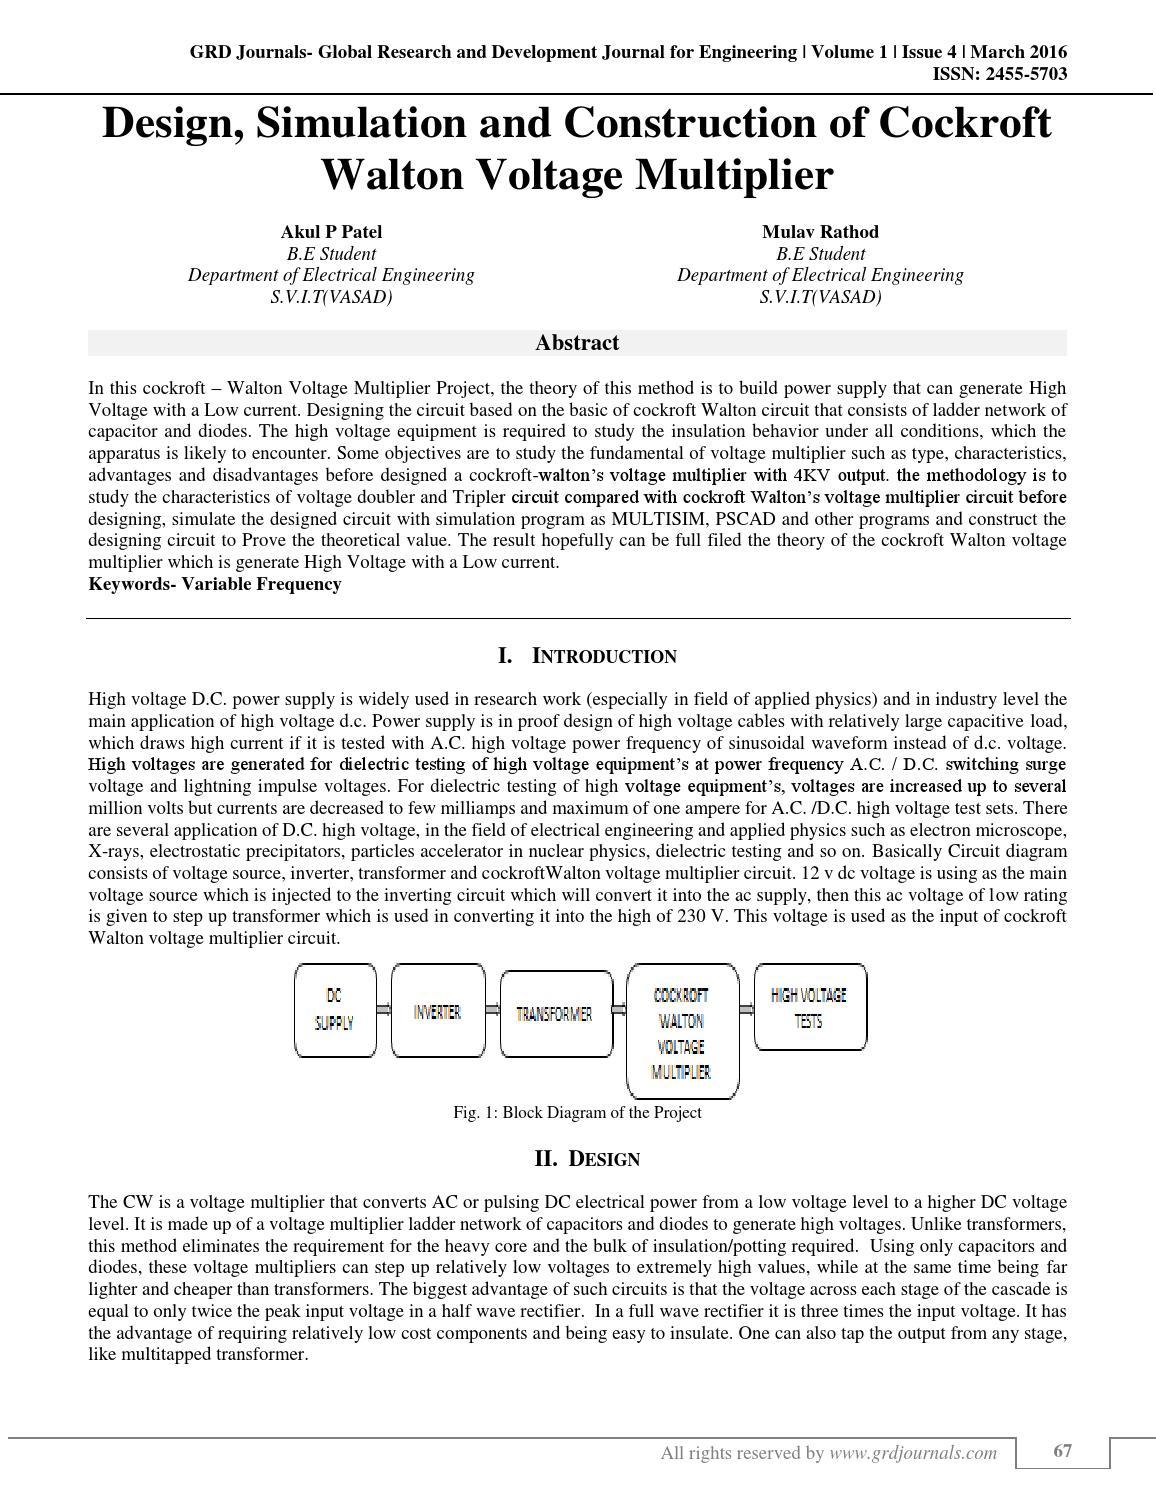 Design, Simulation and Construction of Cockroft Walton Voltage